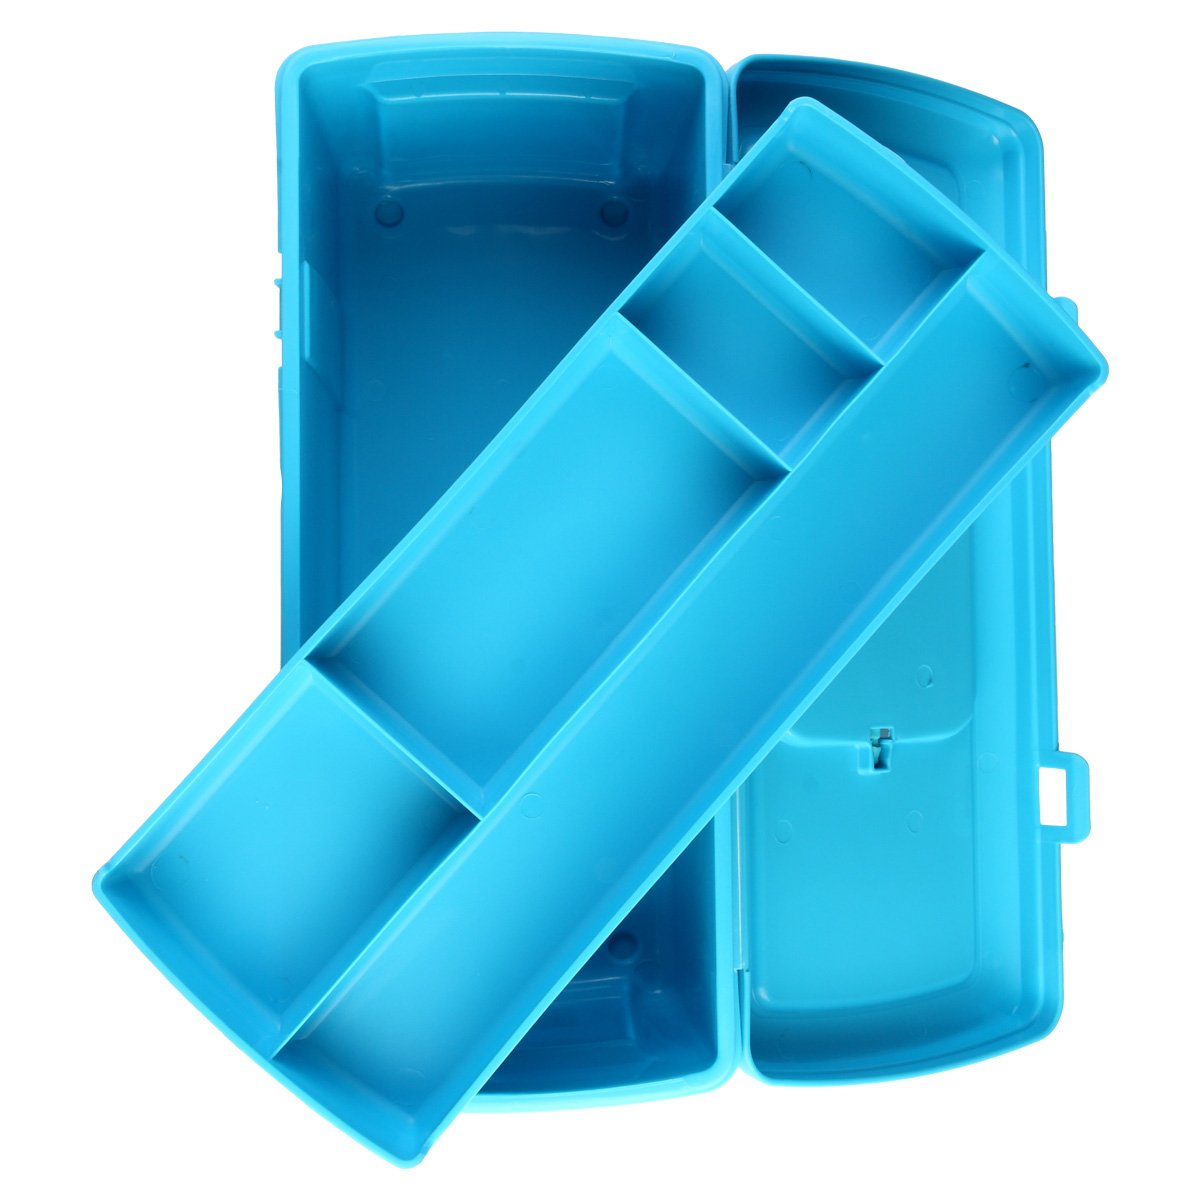 New Whitefurze plastica multifunzionale Utility box Handy Home & Office Storage